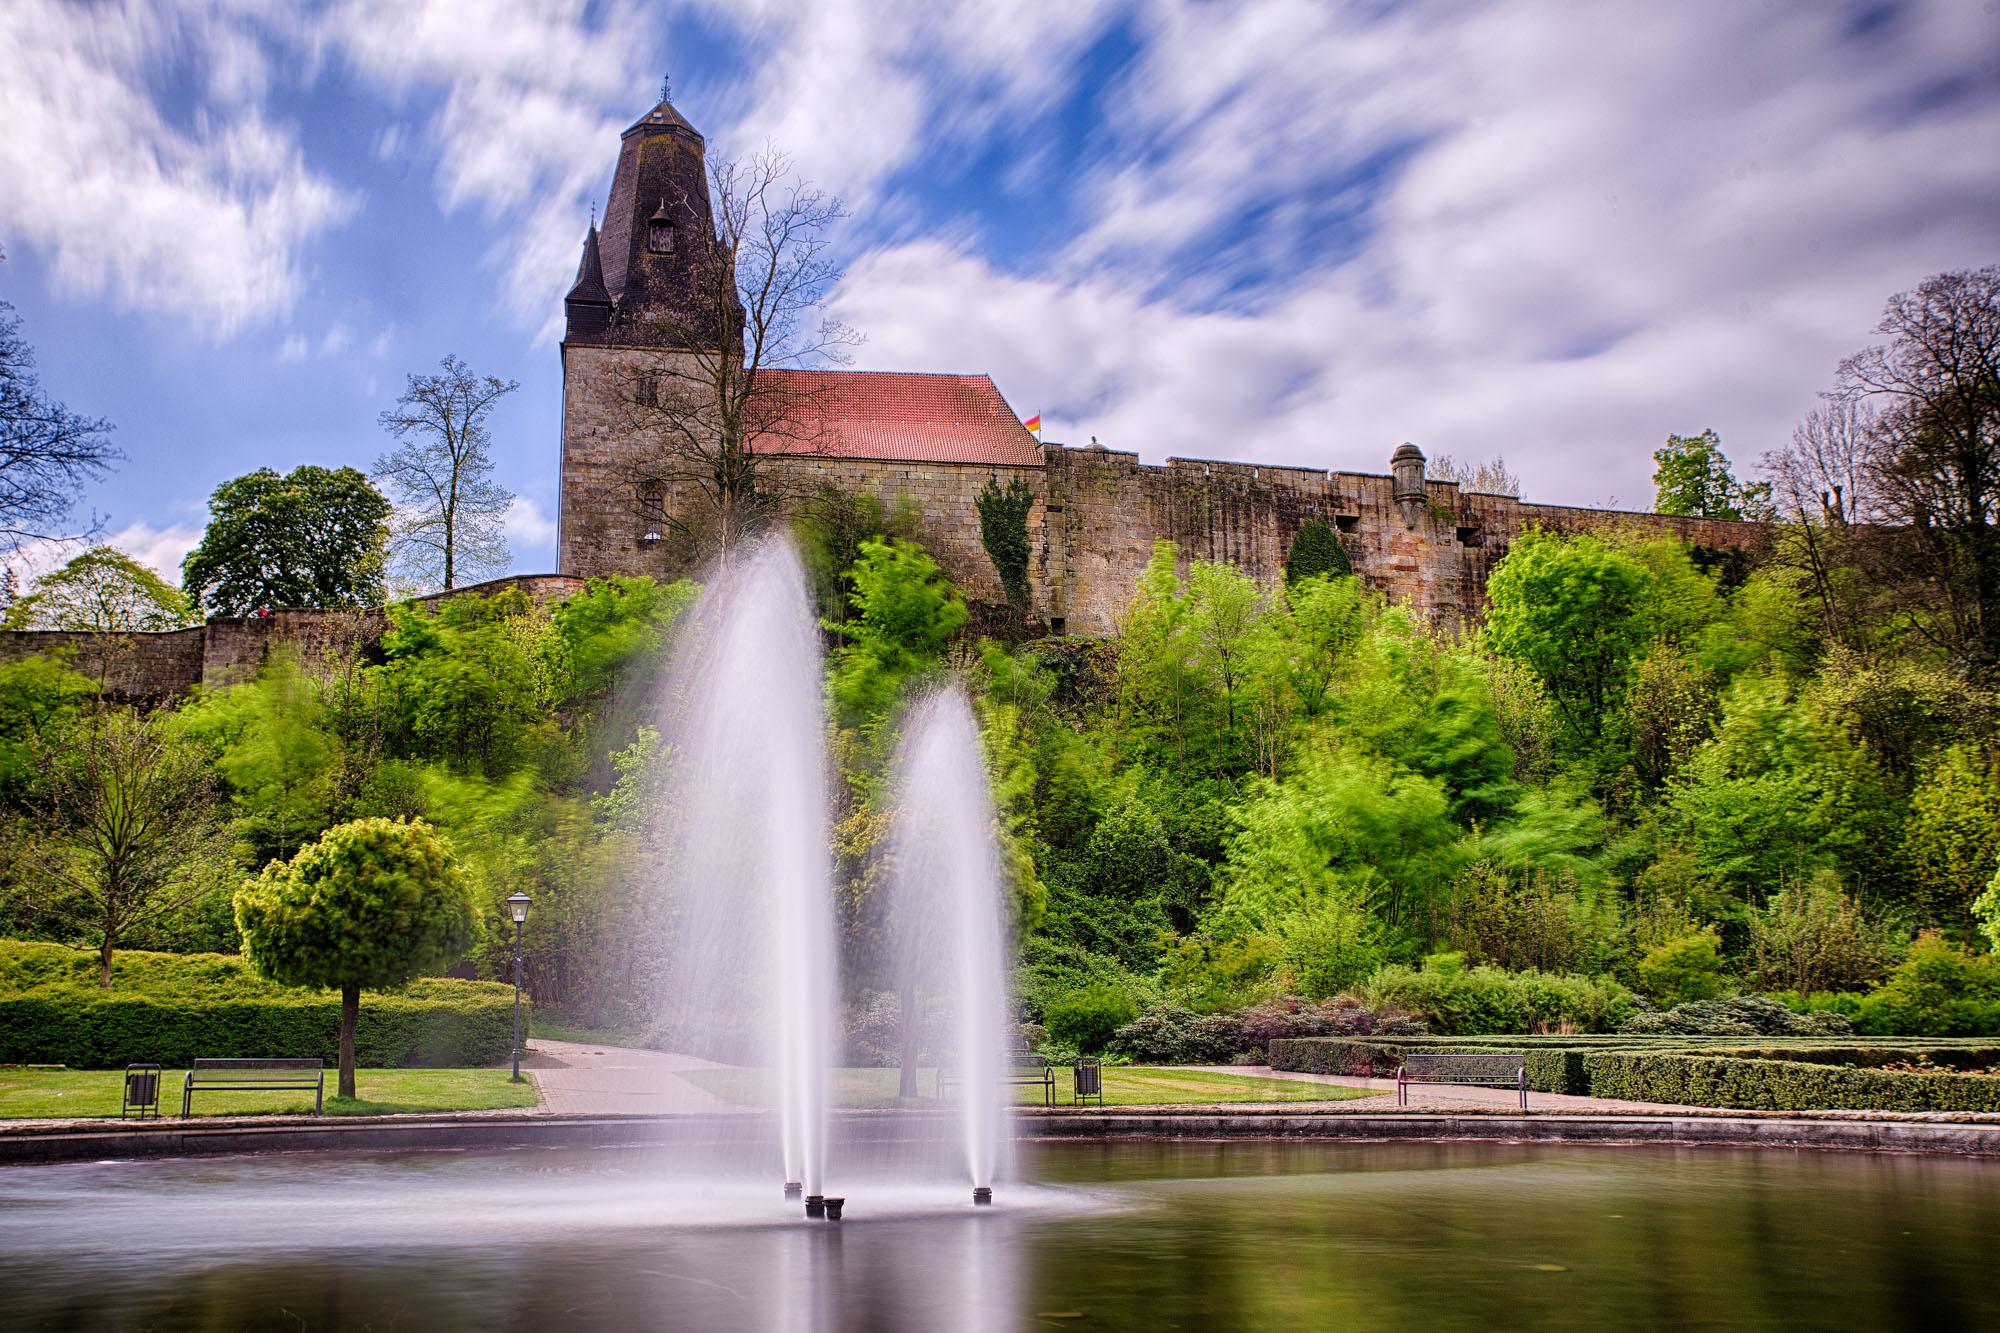 Castle park Bad Bentheim below the castle